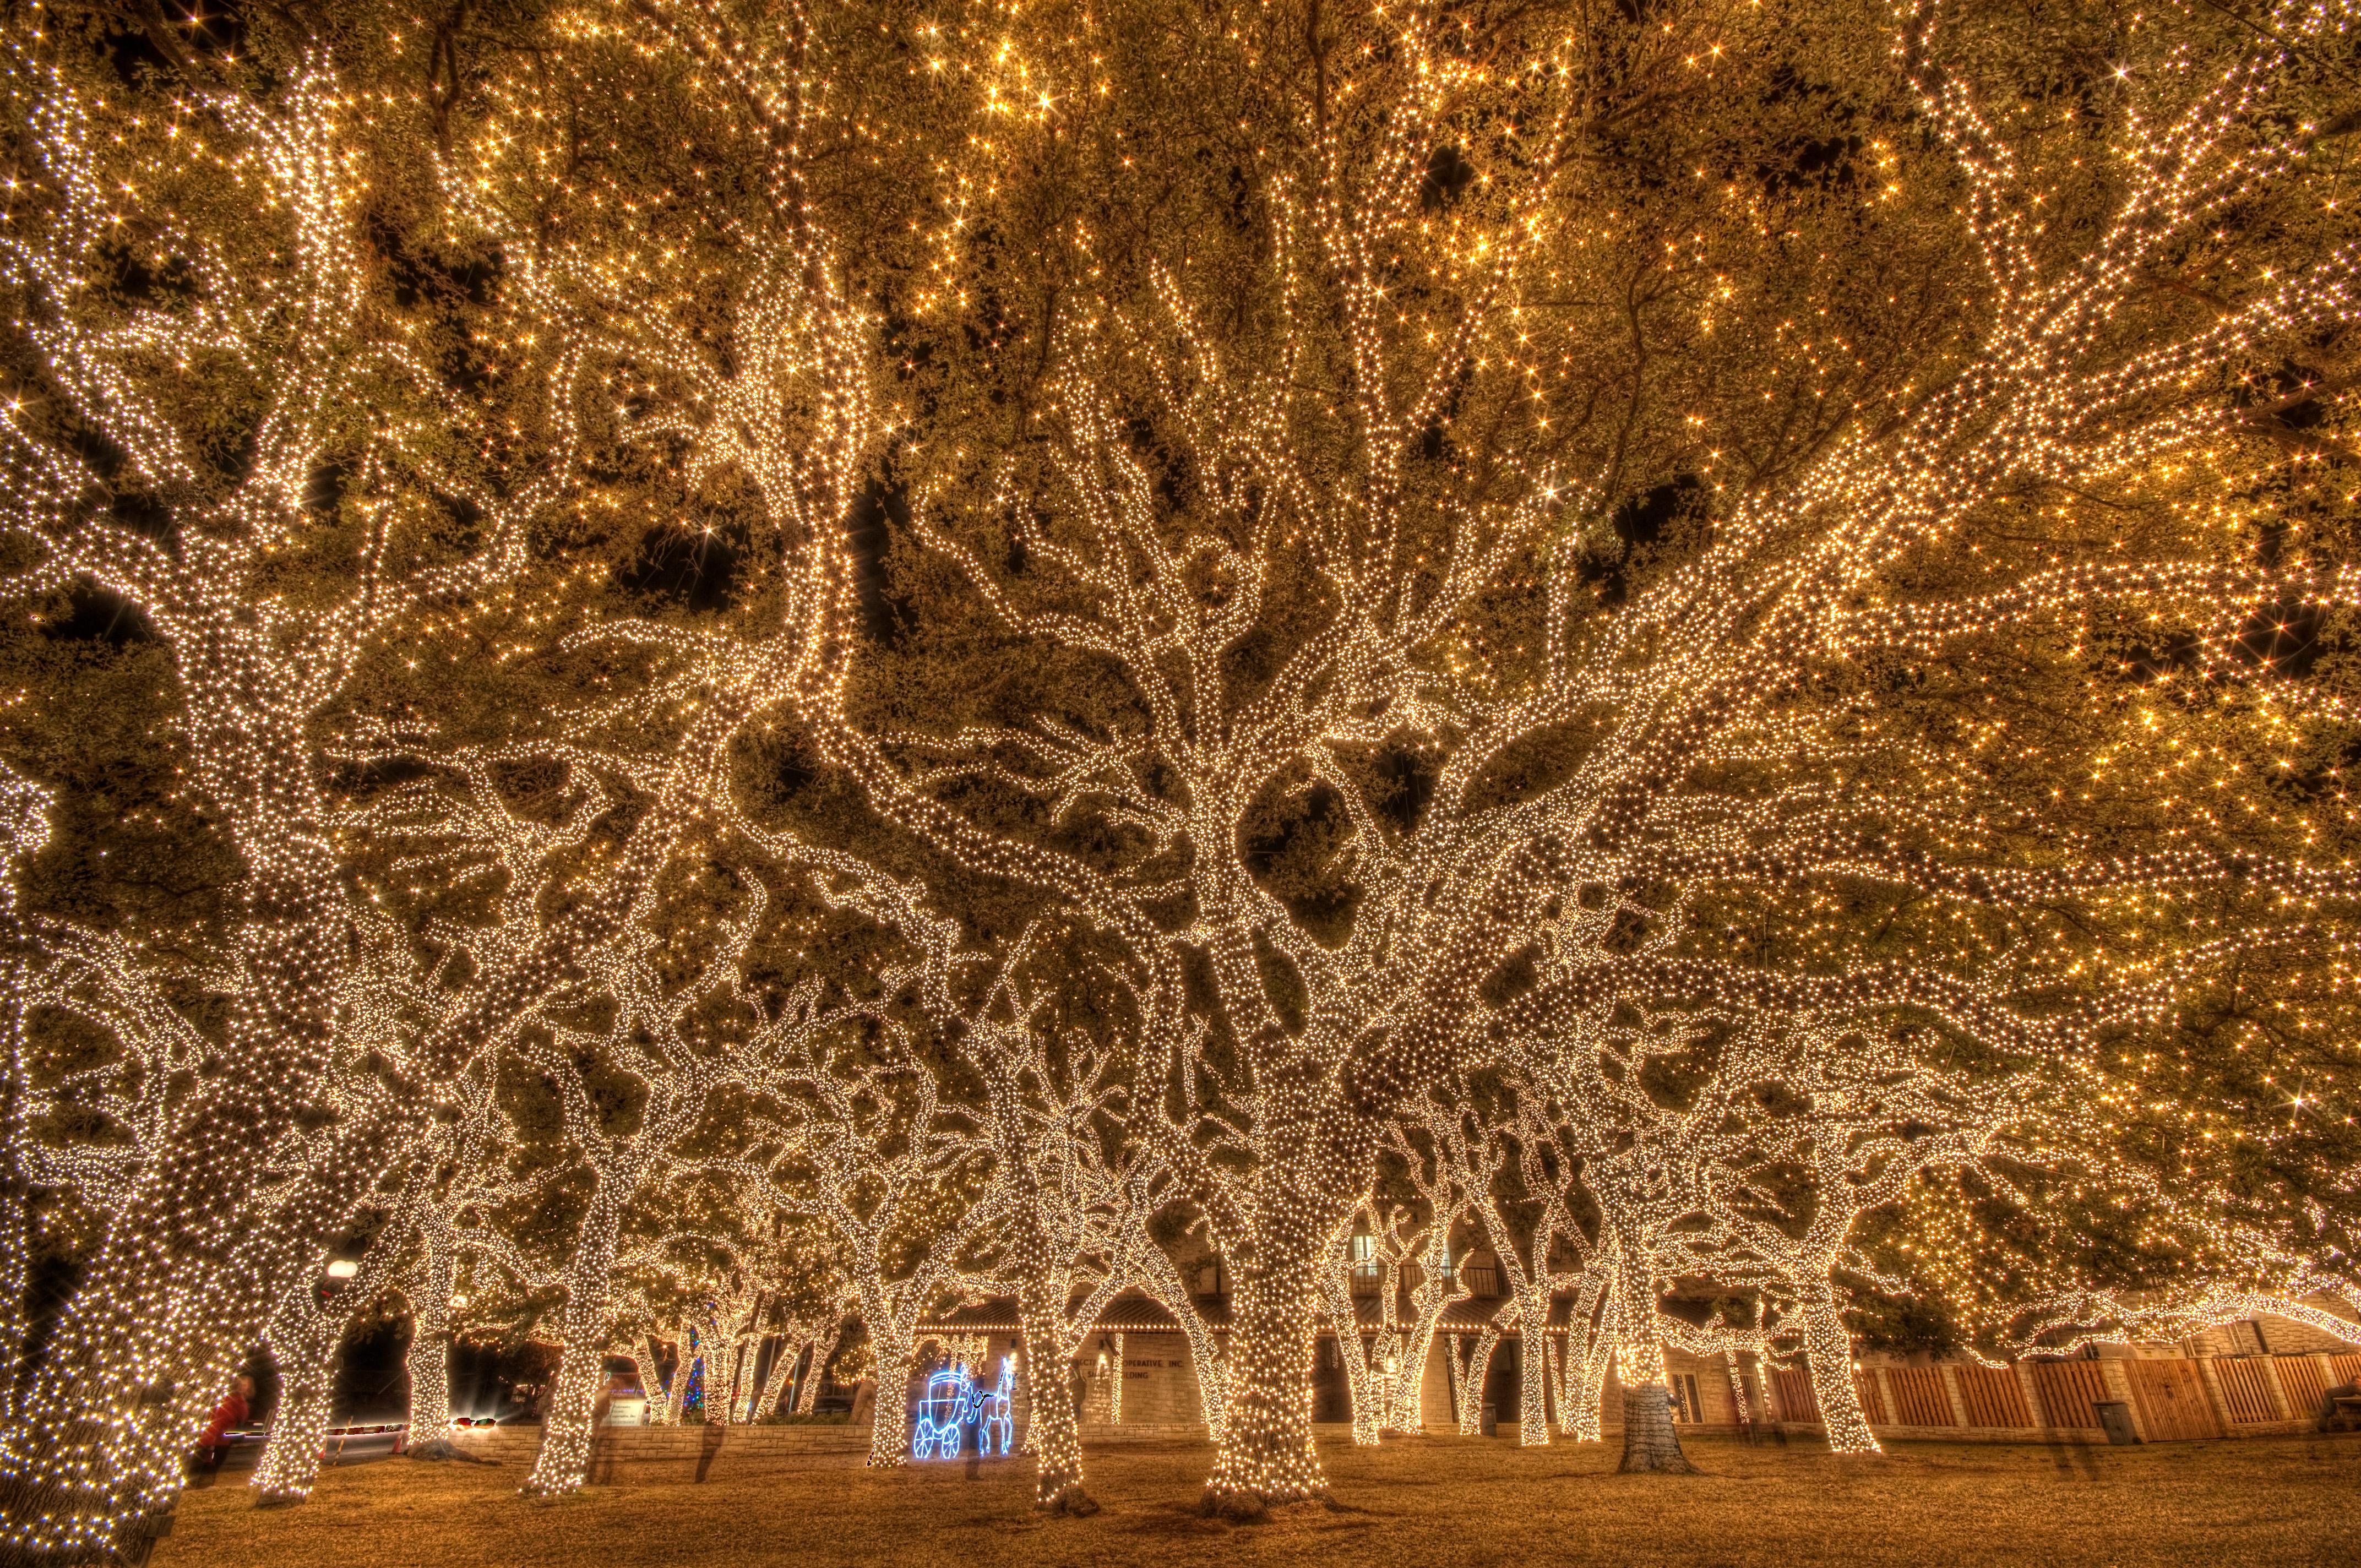 Johnson City Courthouse Christmas Lights